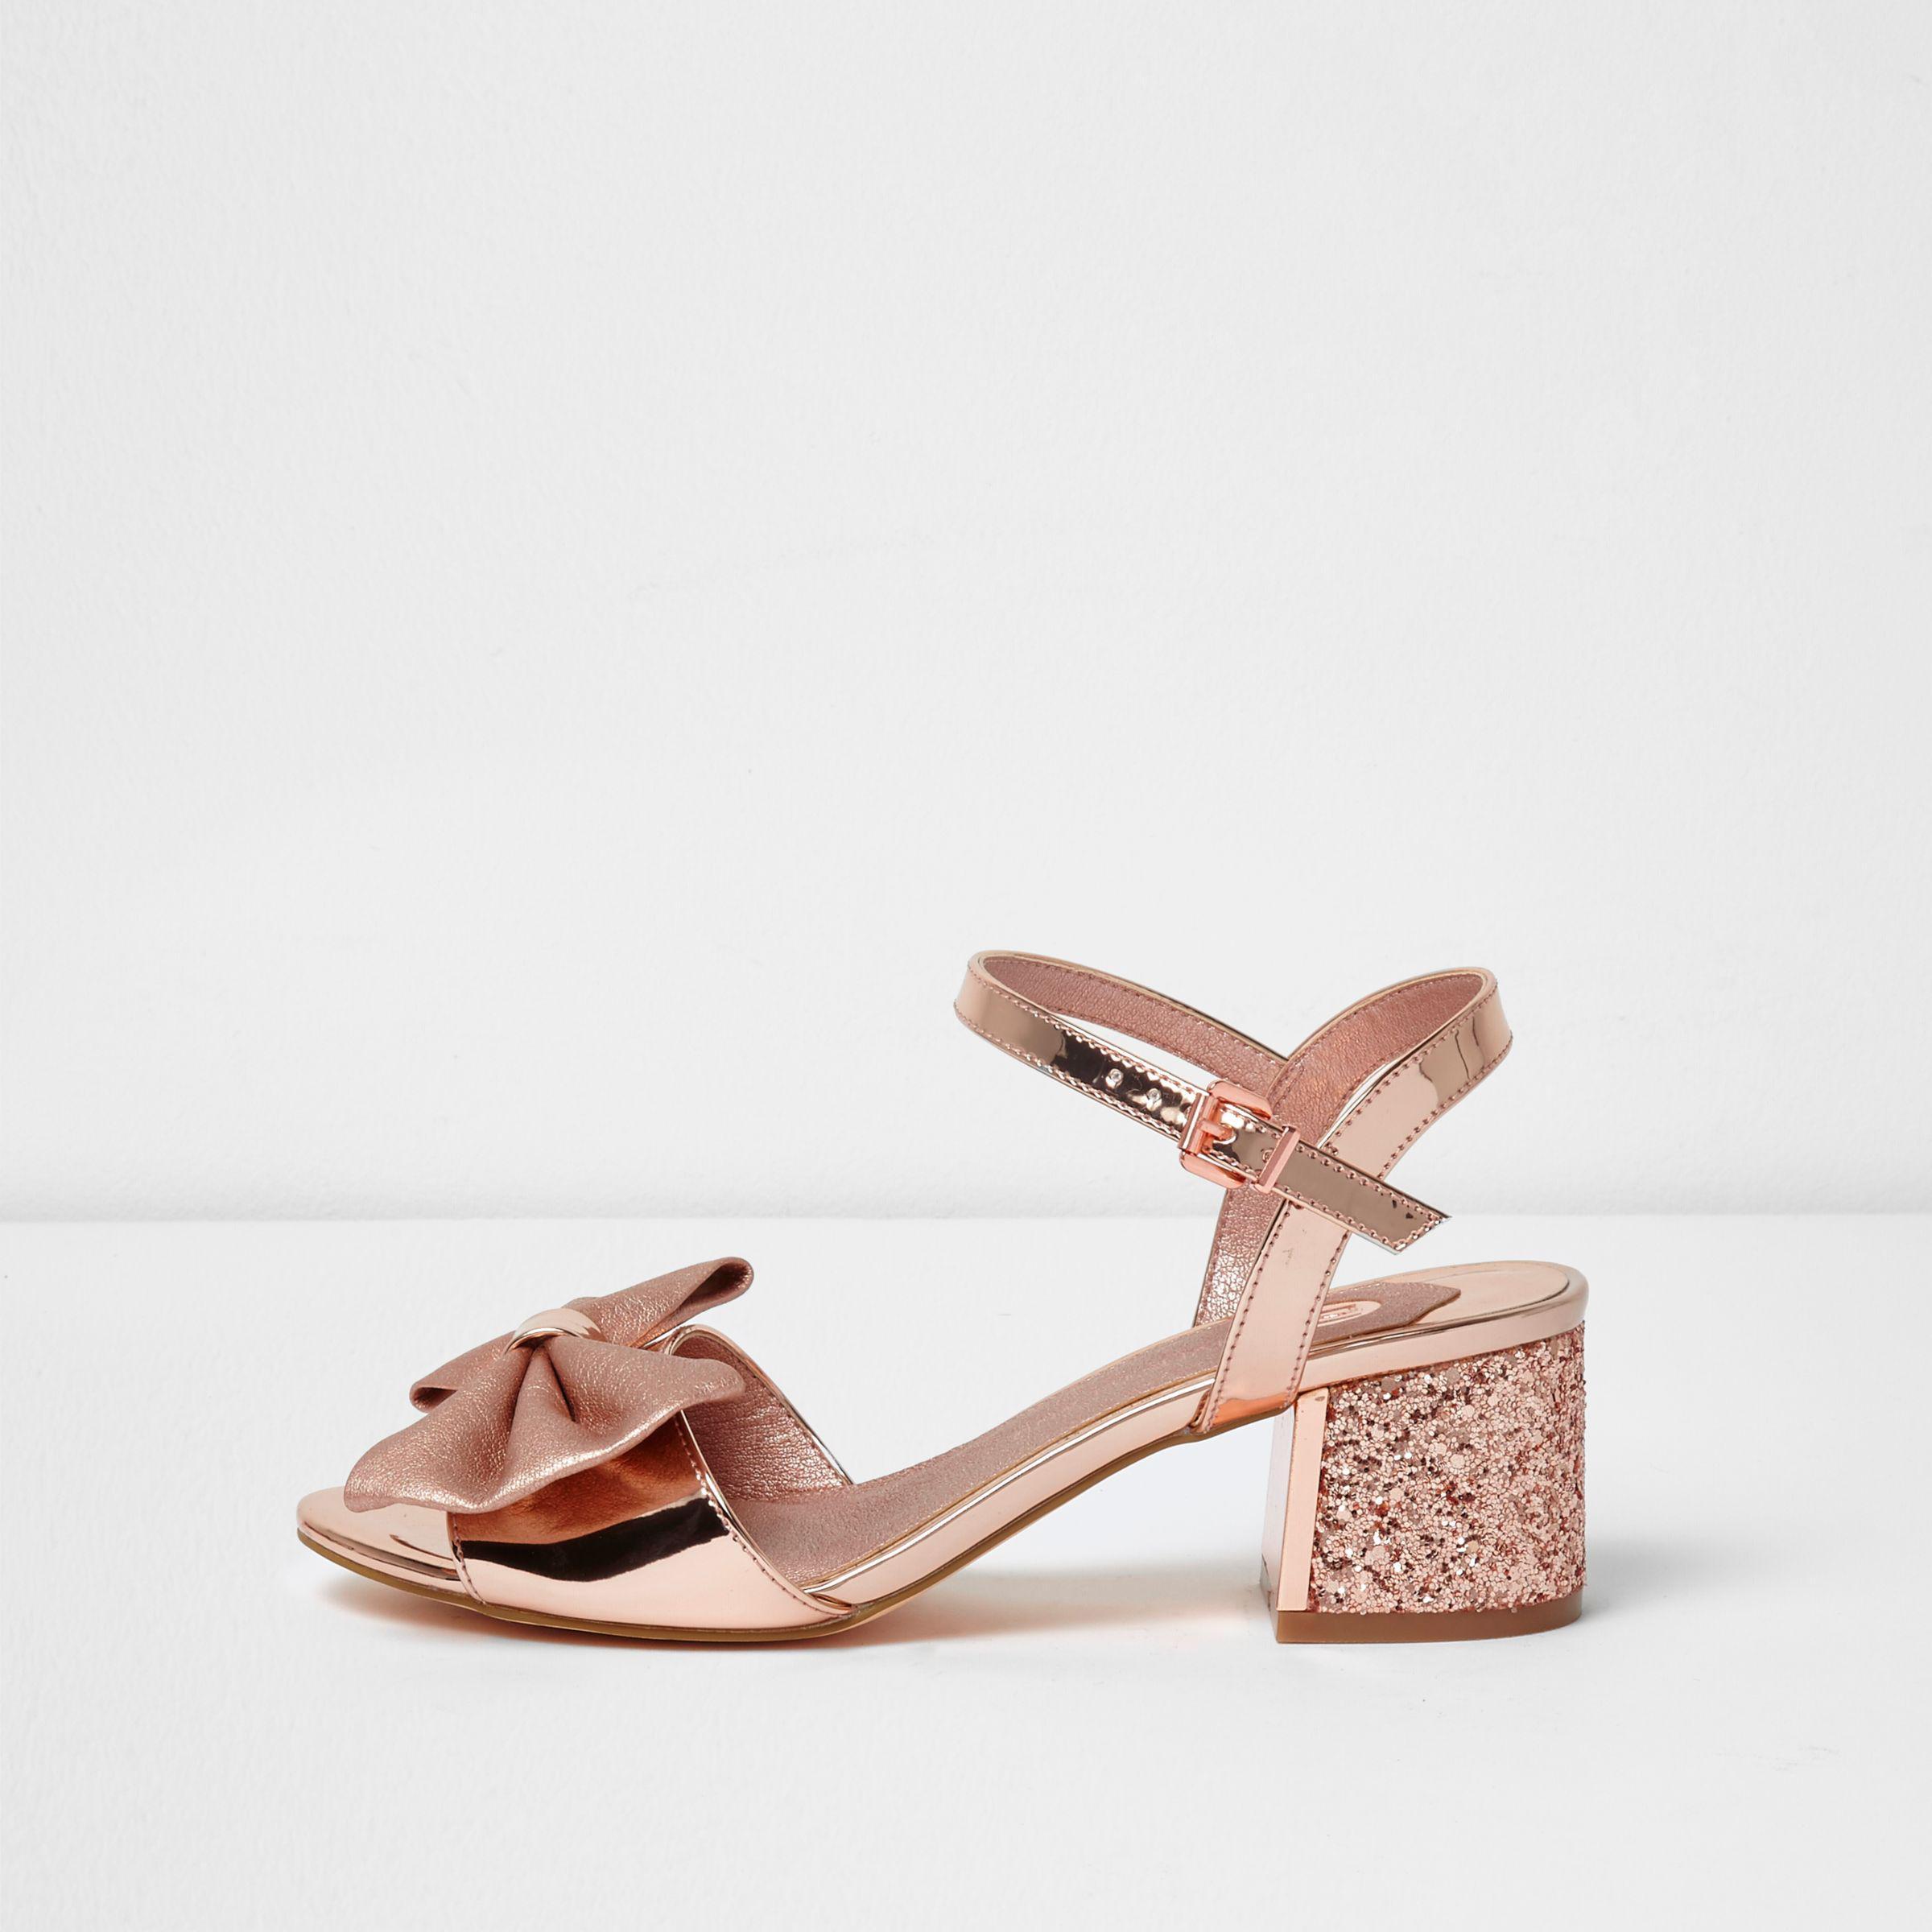 1c1040de96a River Island Rose Gold Metallic Bow Block Heel Sandals in Pink - Lyst